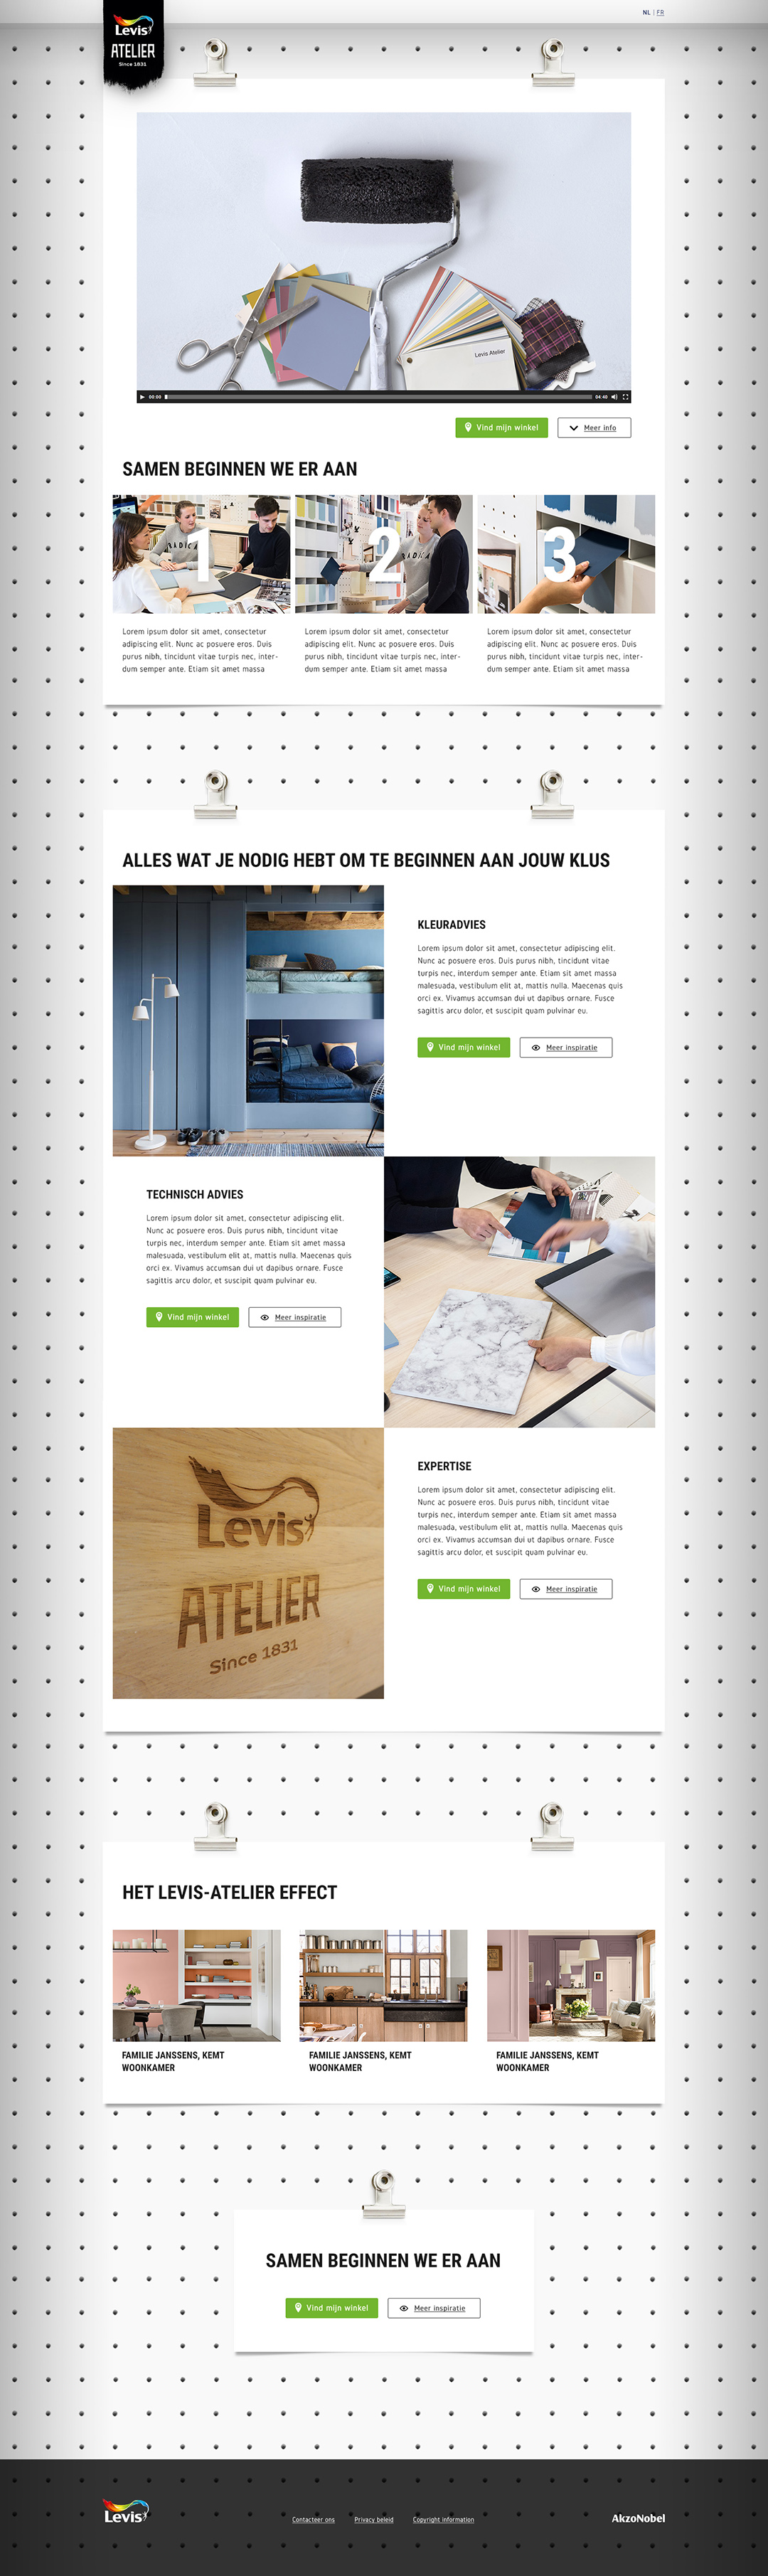 Levis Atelier v02 - 01 Home